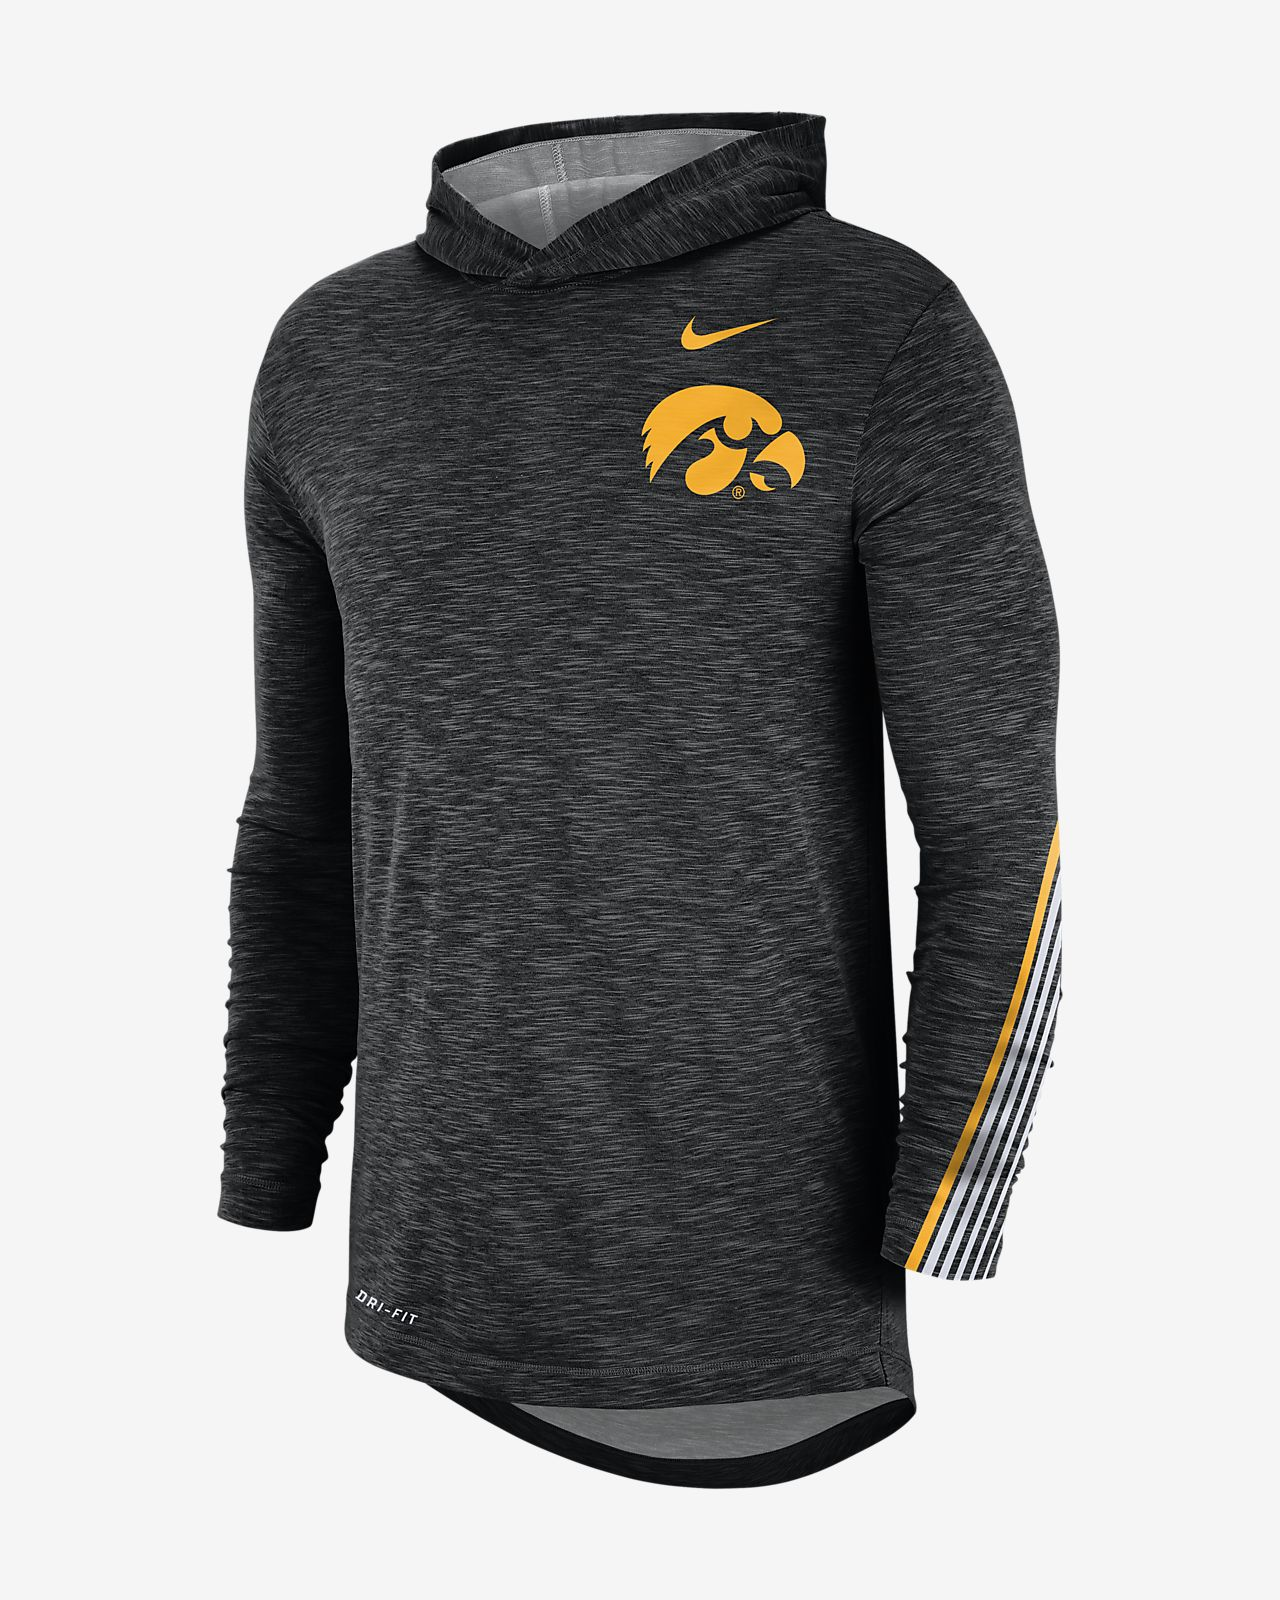 Nike College (Iowa) Men's Long-Sleeve Hooded T-Shirt